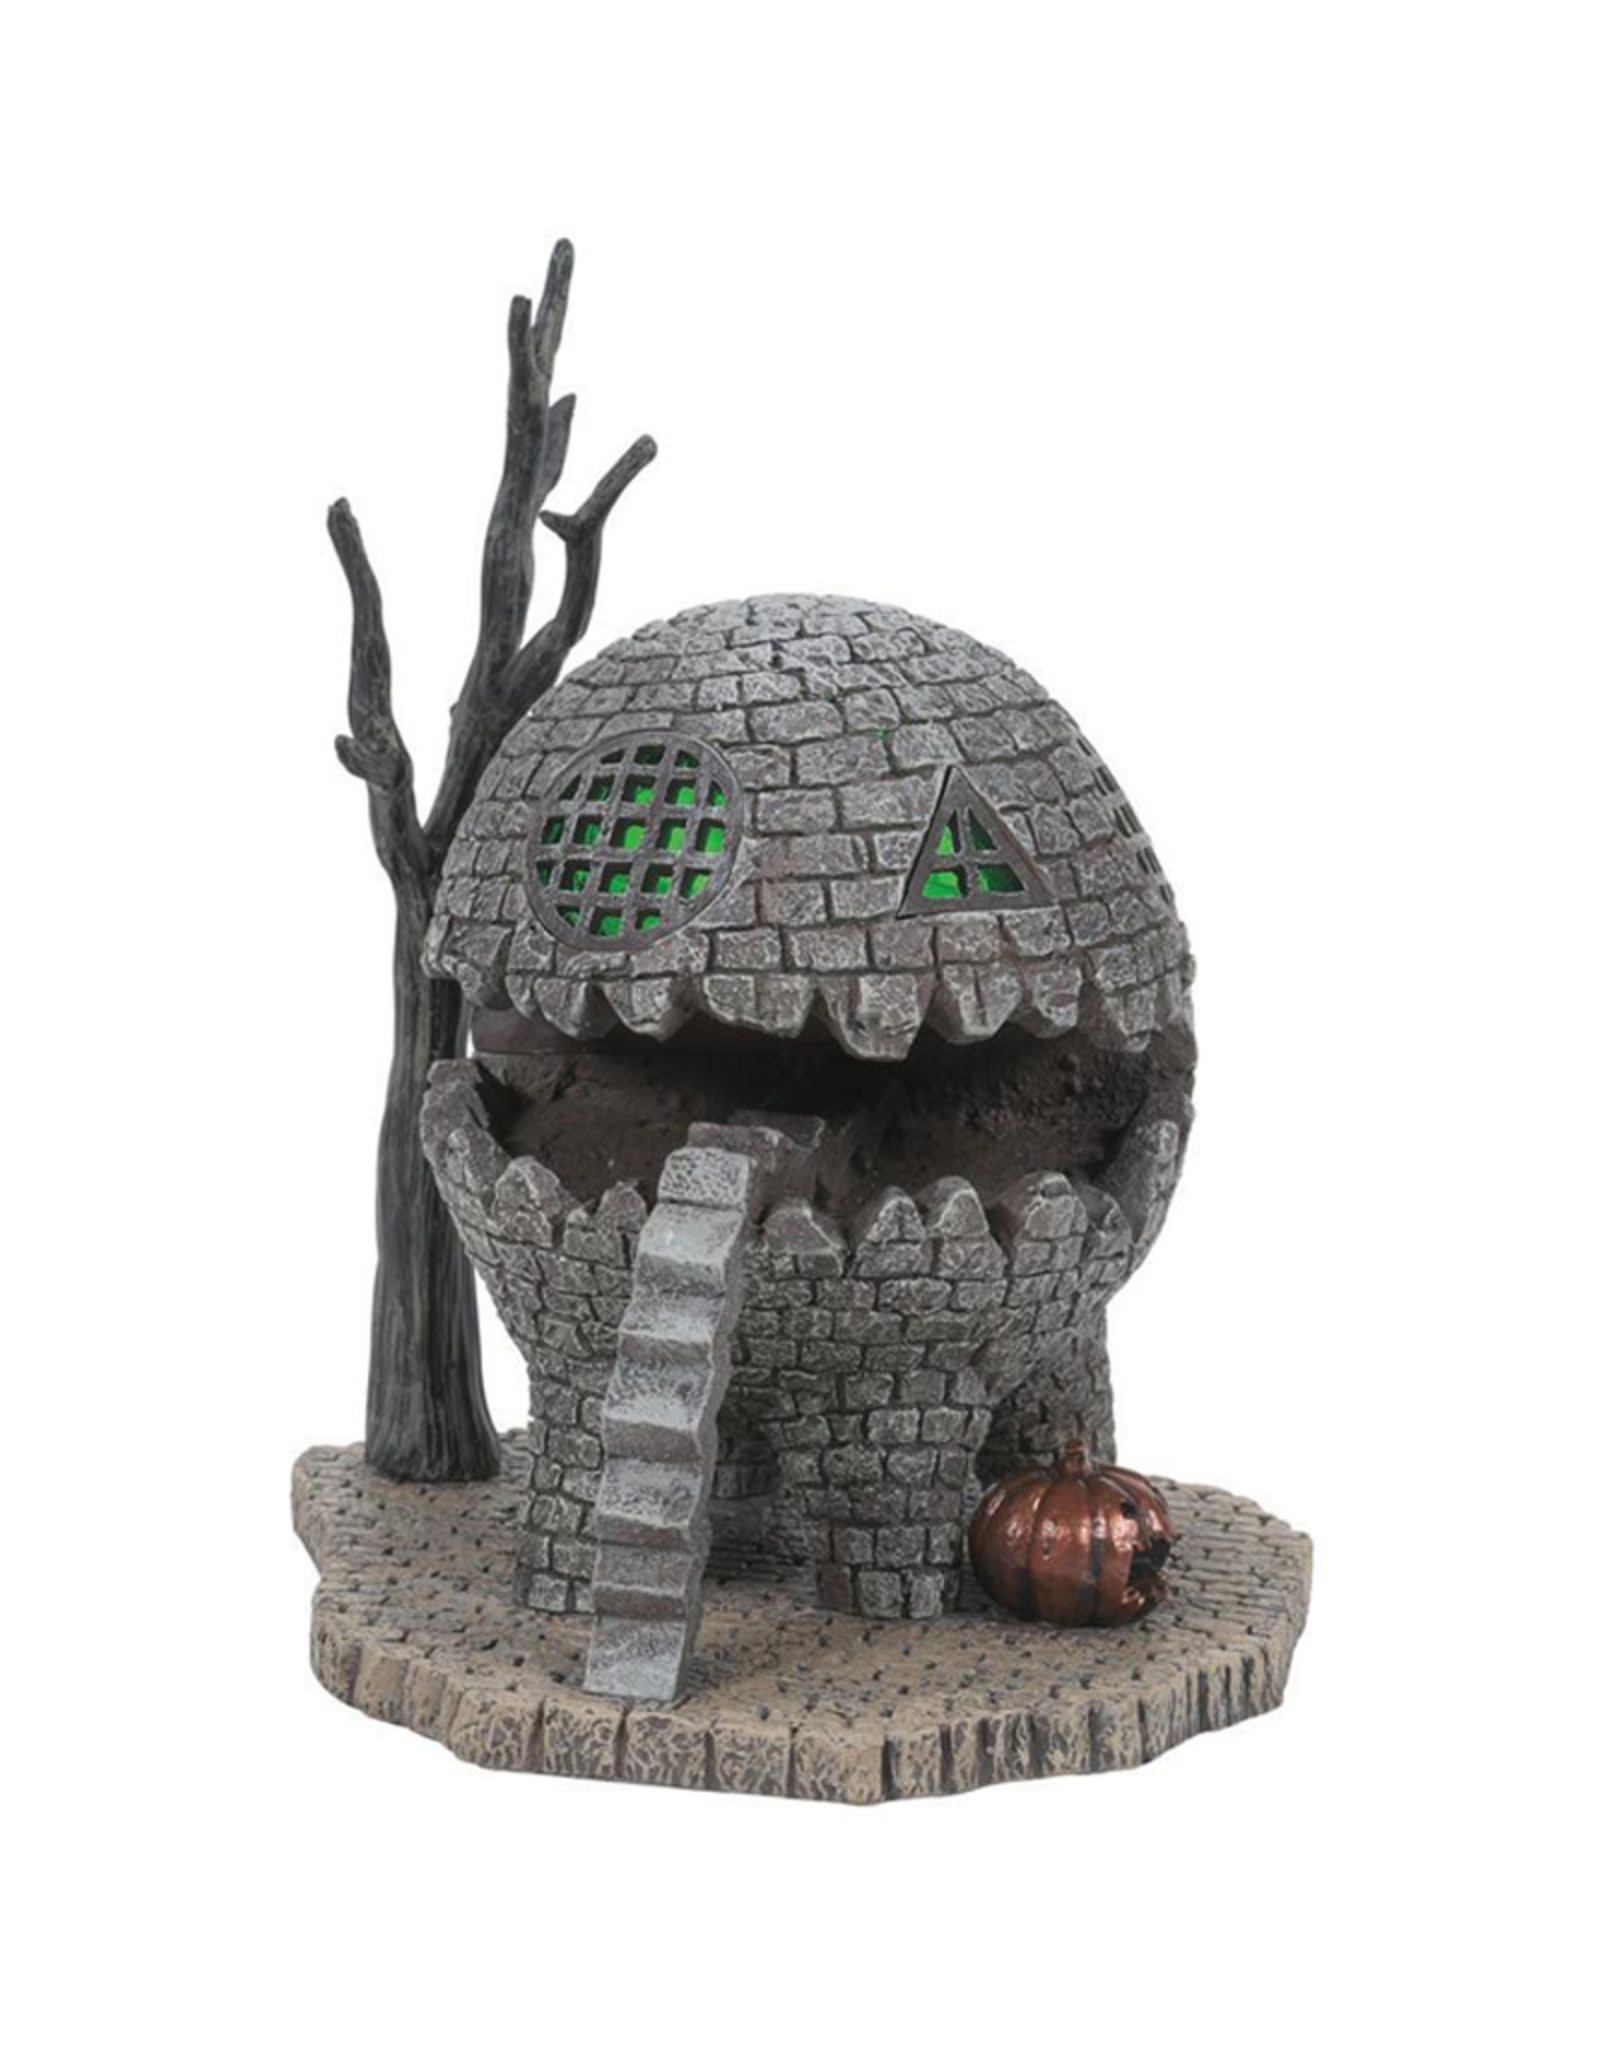 The Nightmare Before Christmas ( Department 56 Figurine ) Lizard House